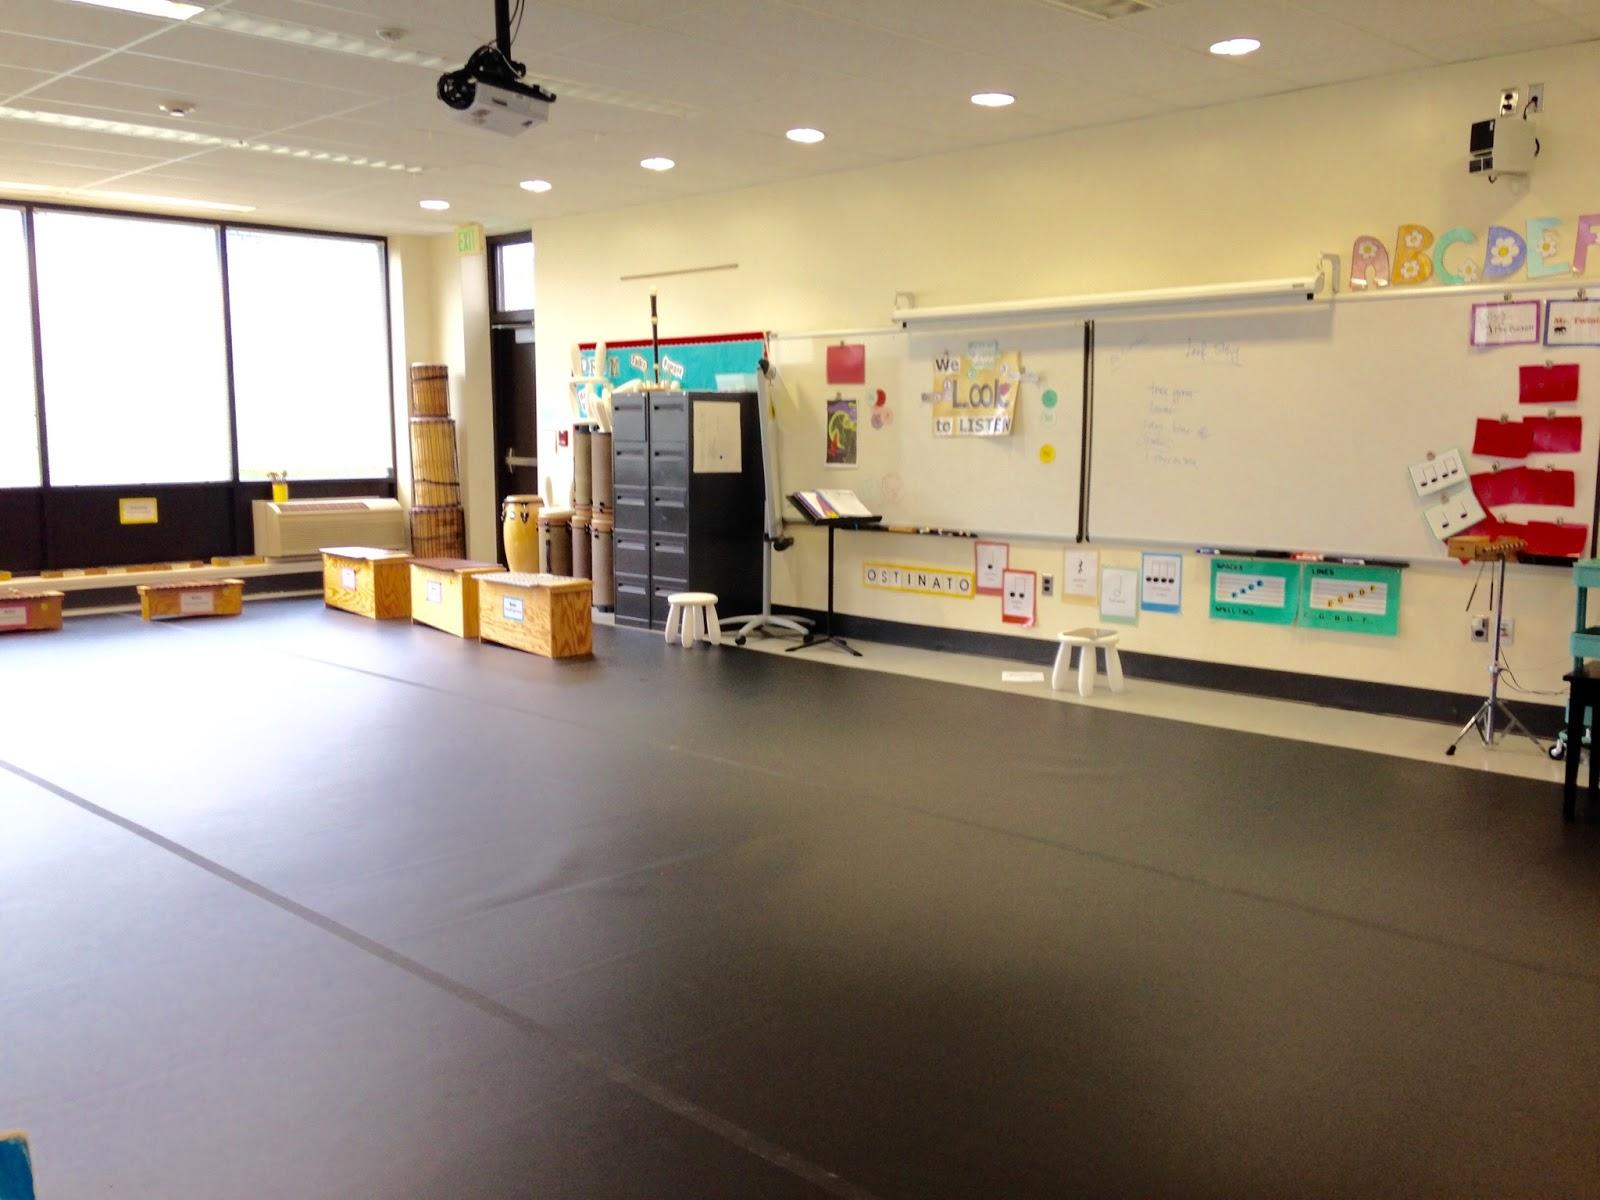 exercise htm hop sport court marley dance leap studio hip floor tap jazz floors studios calgary